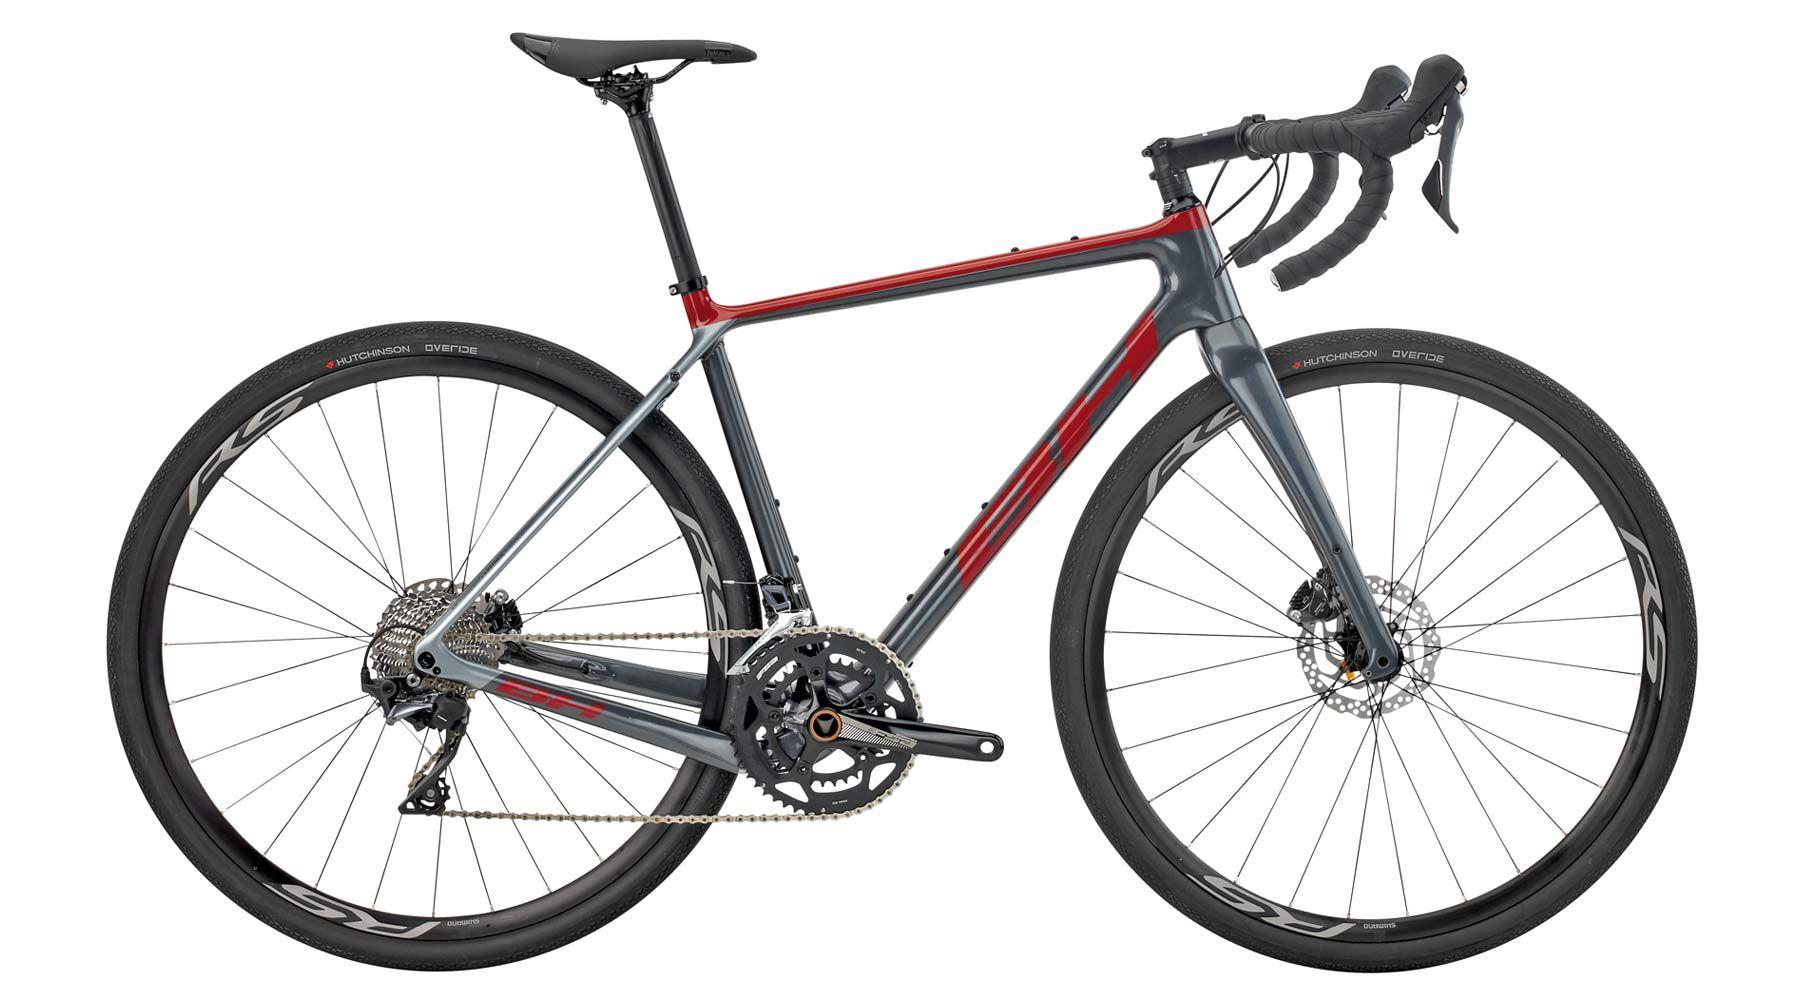 Bh Gravelx Evo Carbon Lays Up Affordable Versatile Performance Gravel Bikes With Grx Di2 Bikerumor Gravel Bike Bike Evo